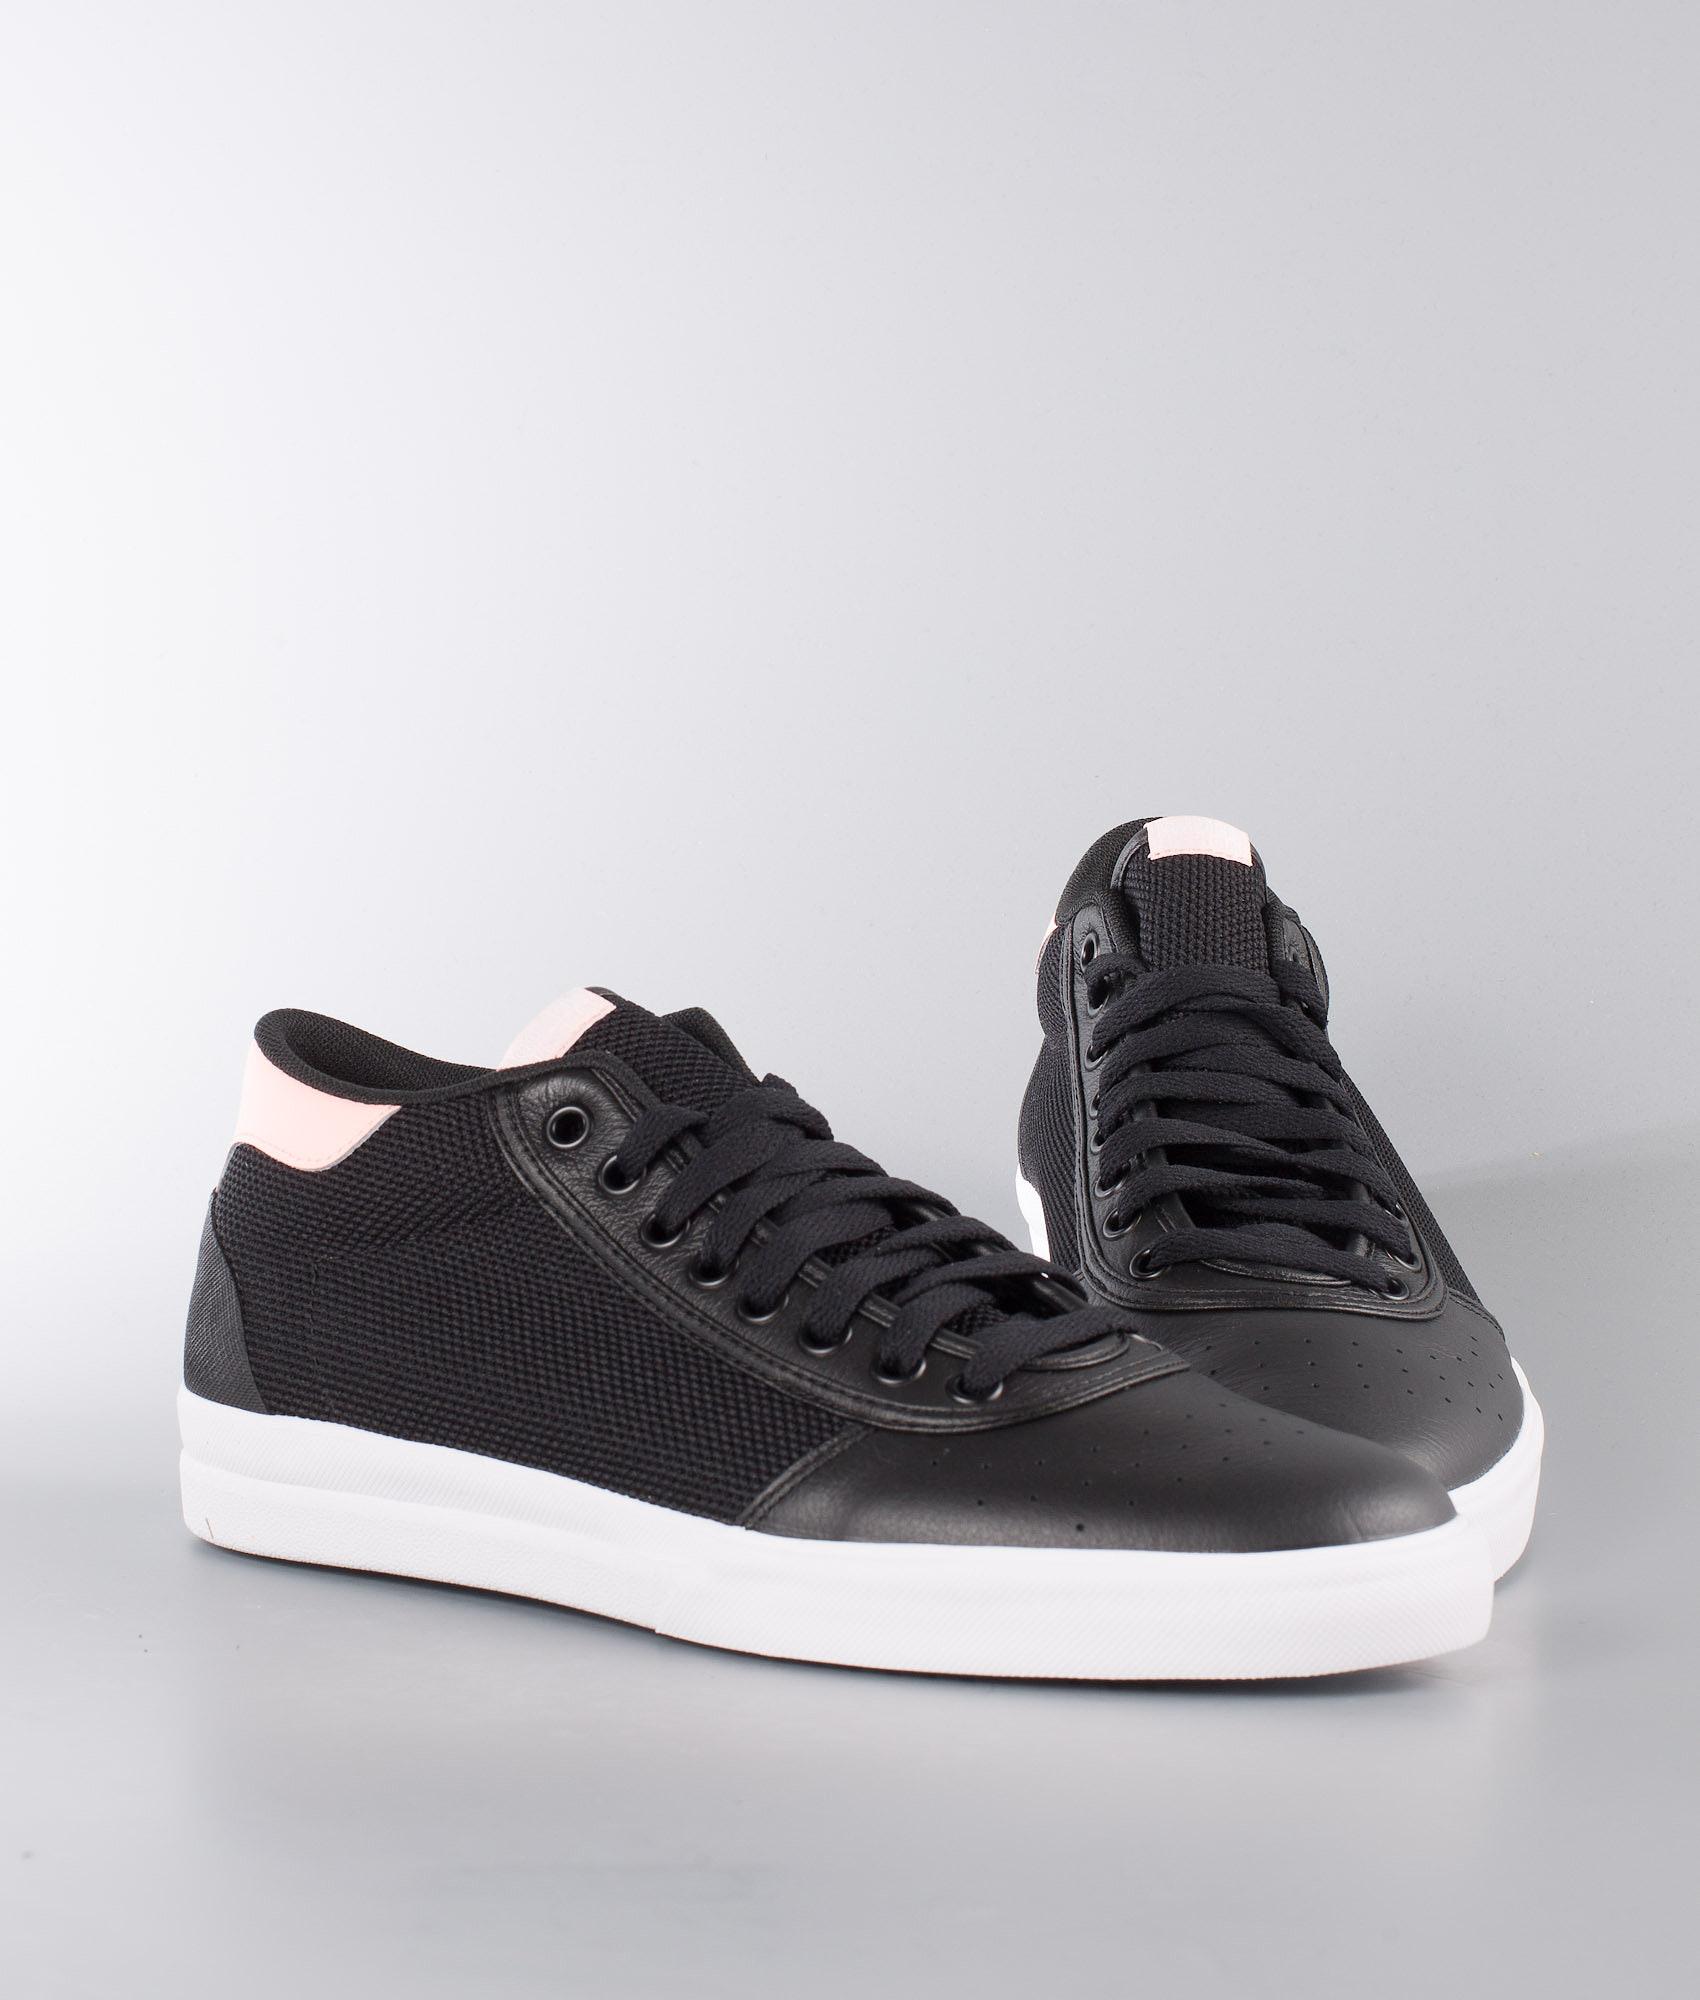 new style 4d16c 15572 Adidas Skateboarding Lucas Premiere Mid Skor